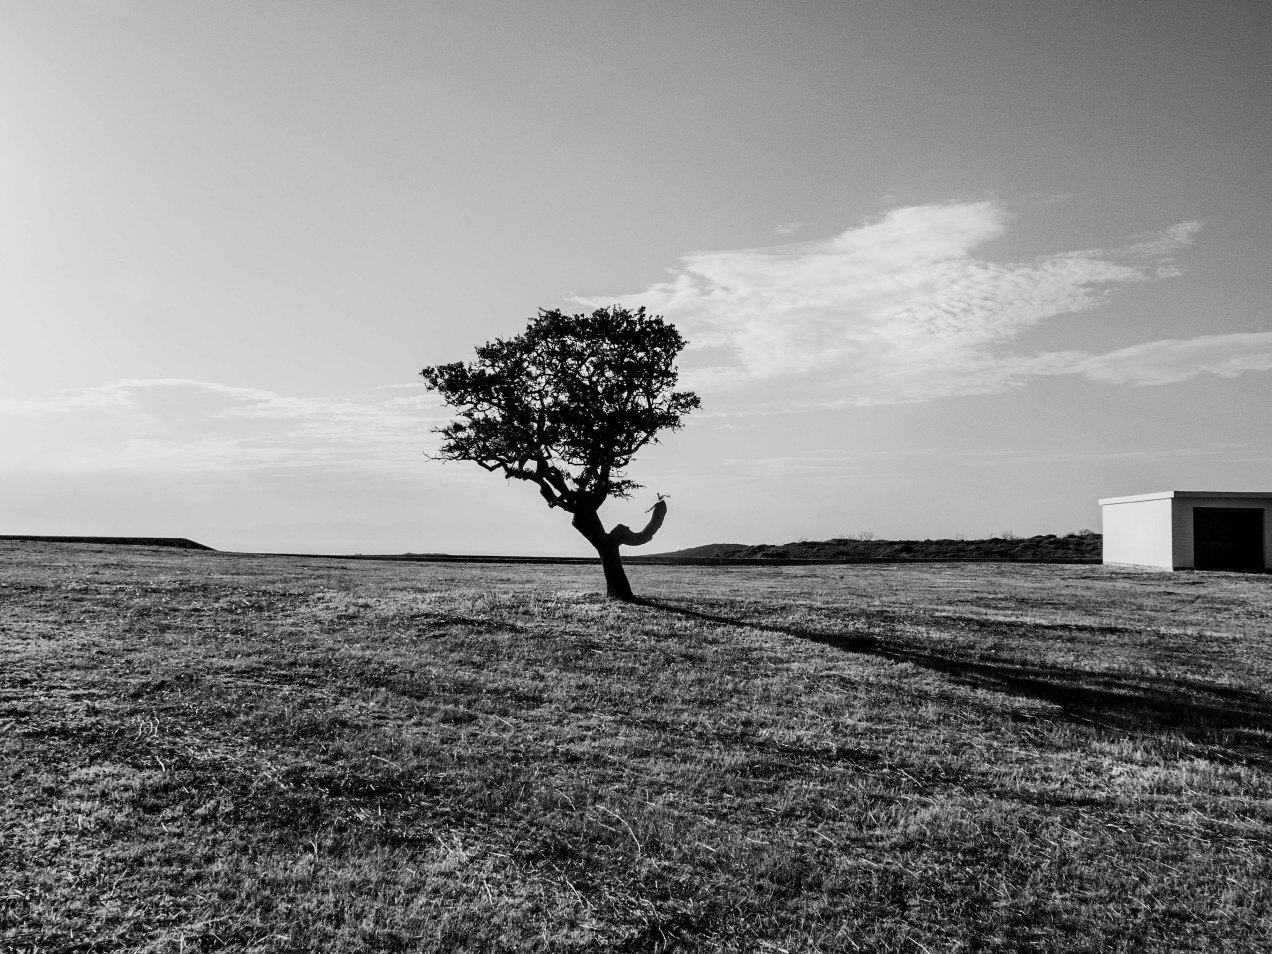 Terrain vague, Cythère, gildalliere, 2015